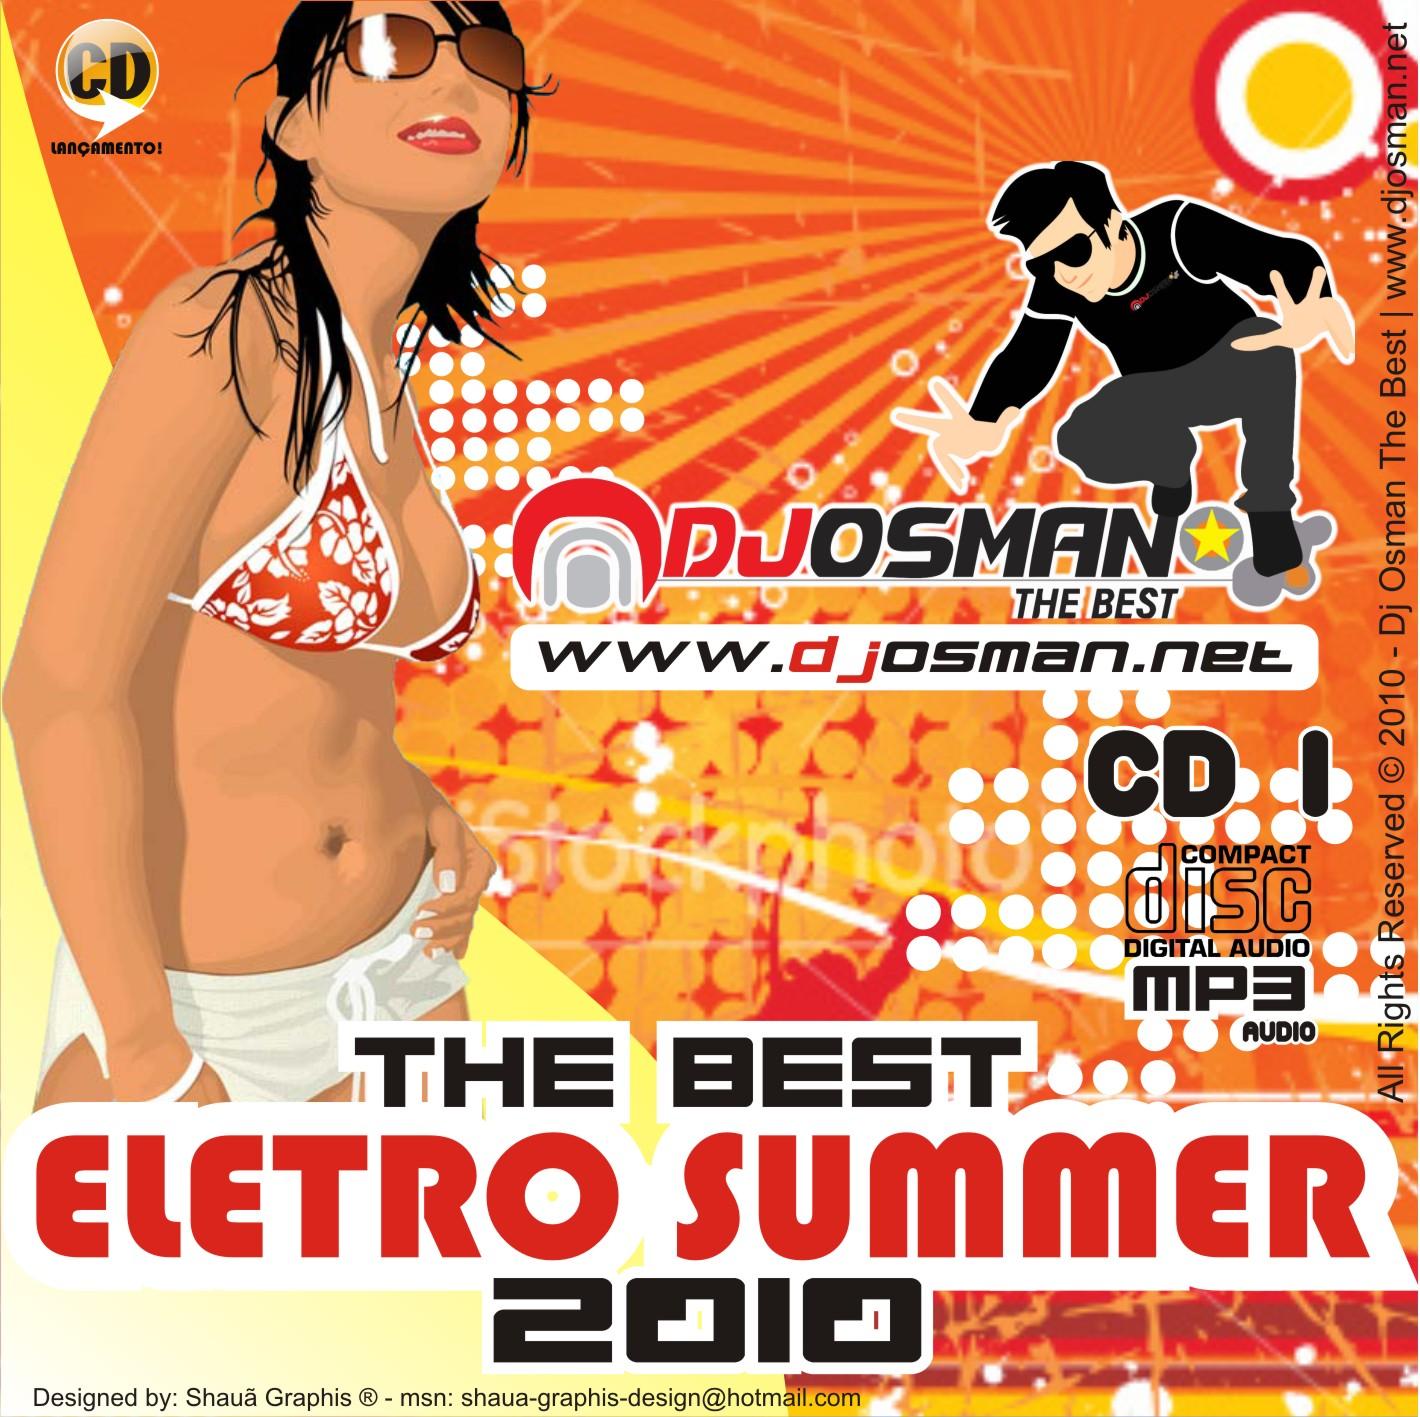 http://3.bp.blogspot.com/_IHX7D4yJrG4/S9NigUdwraI/AAAAAAAADeg/H5l-YD6BpdY/s1600/CAPA+CD+1++Dj+Osman+The+Best+Eletro+Summer.jpg